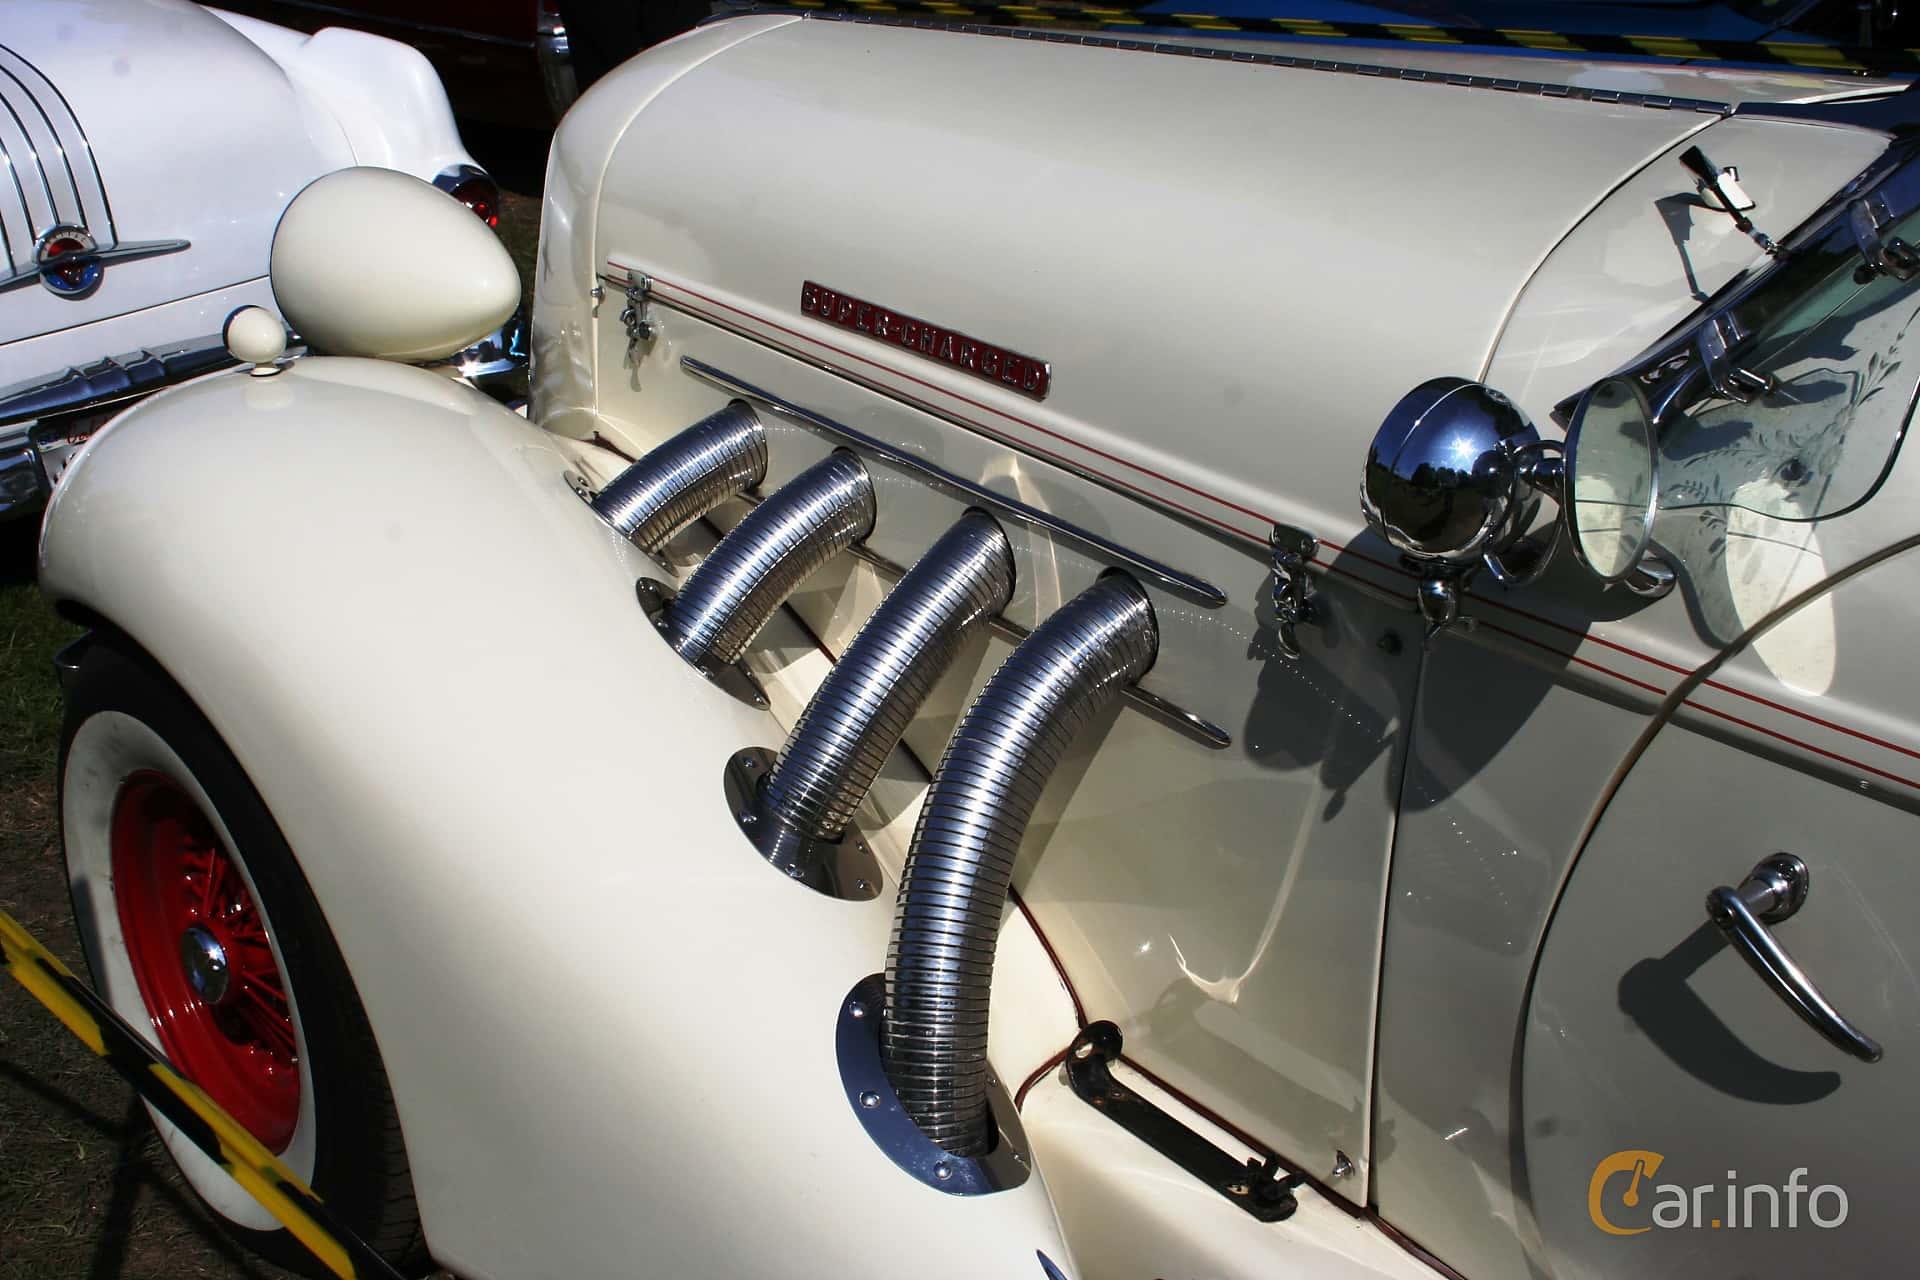 Auburn Model 8-851 Speedster 4.6 Manual, 152hp, 1936 at Hässleholm Power Start of Summer Meet 2016